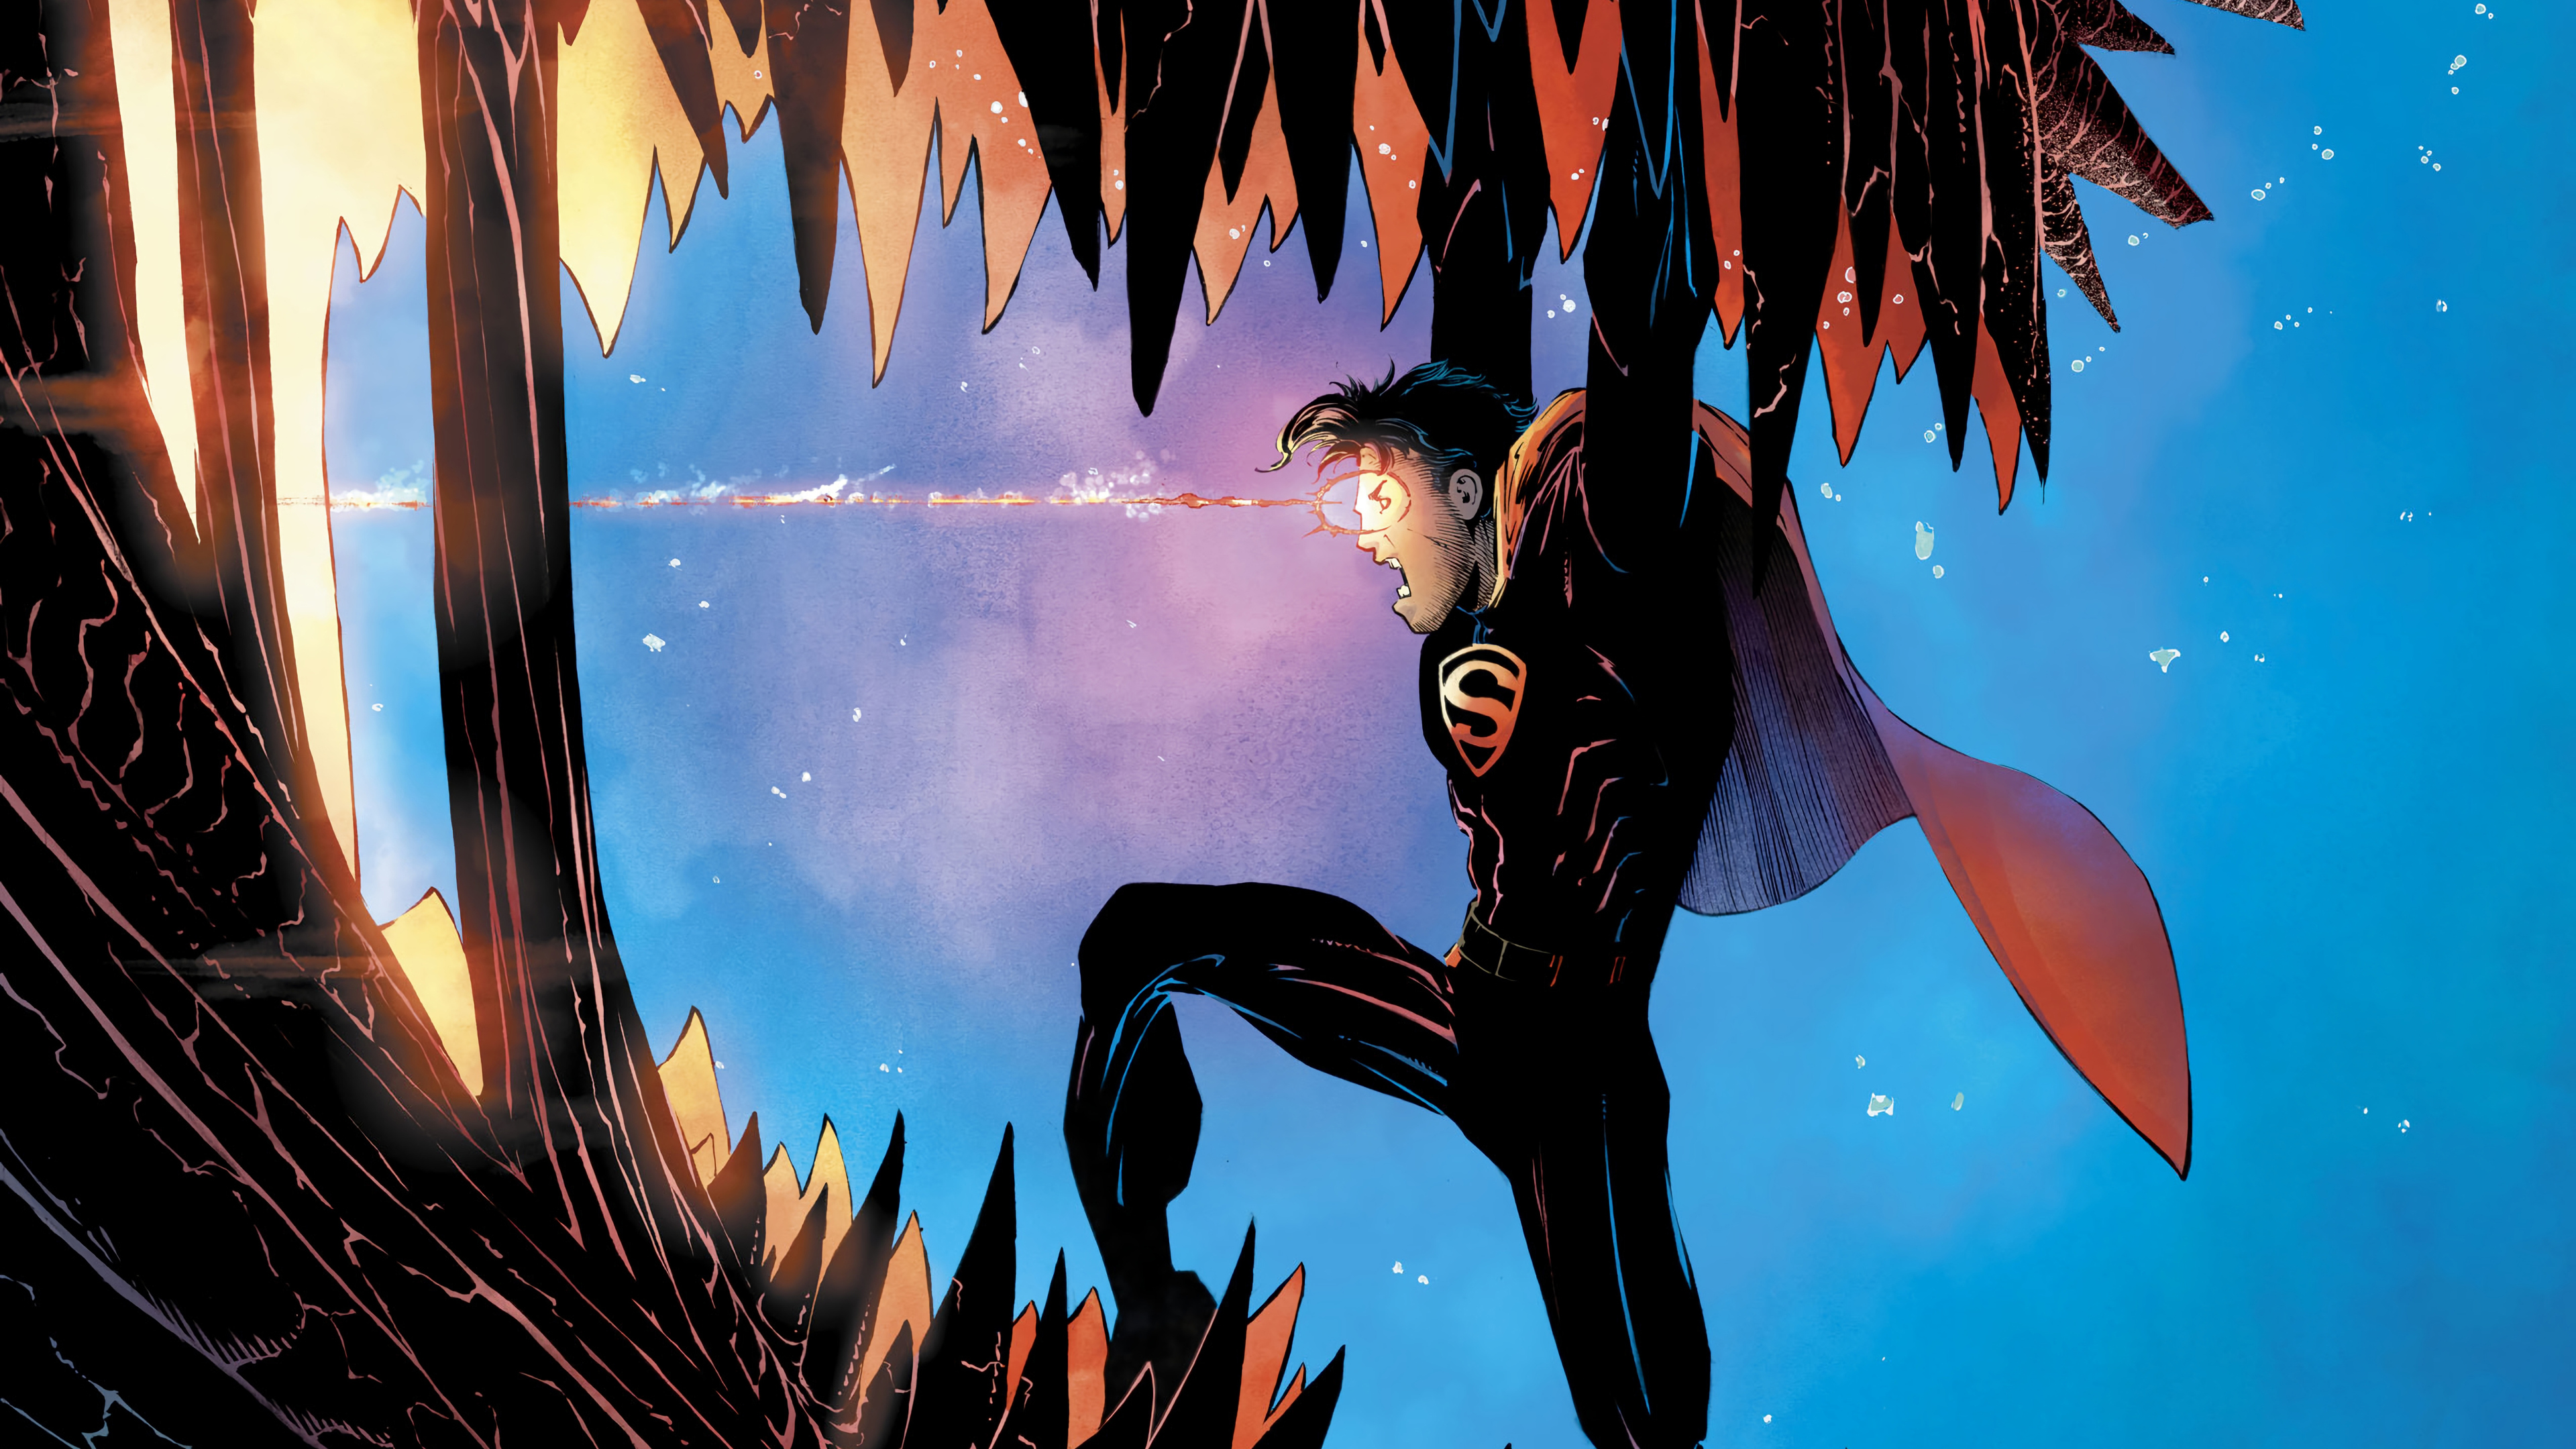 superman year one 1568055228 - Superman Year One - superman wallpapers, superheroes wallpapers, hd-wallpapers, digital art wallpapers, artwork wallpapers, artist wallpapers, 5k wallpapers, 4k-wallpapers